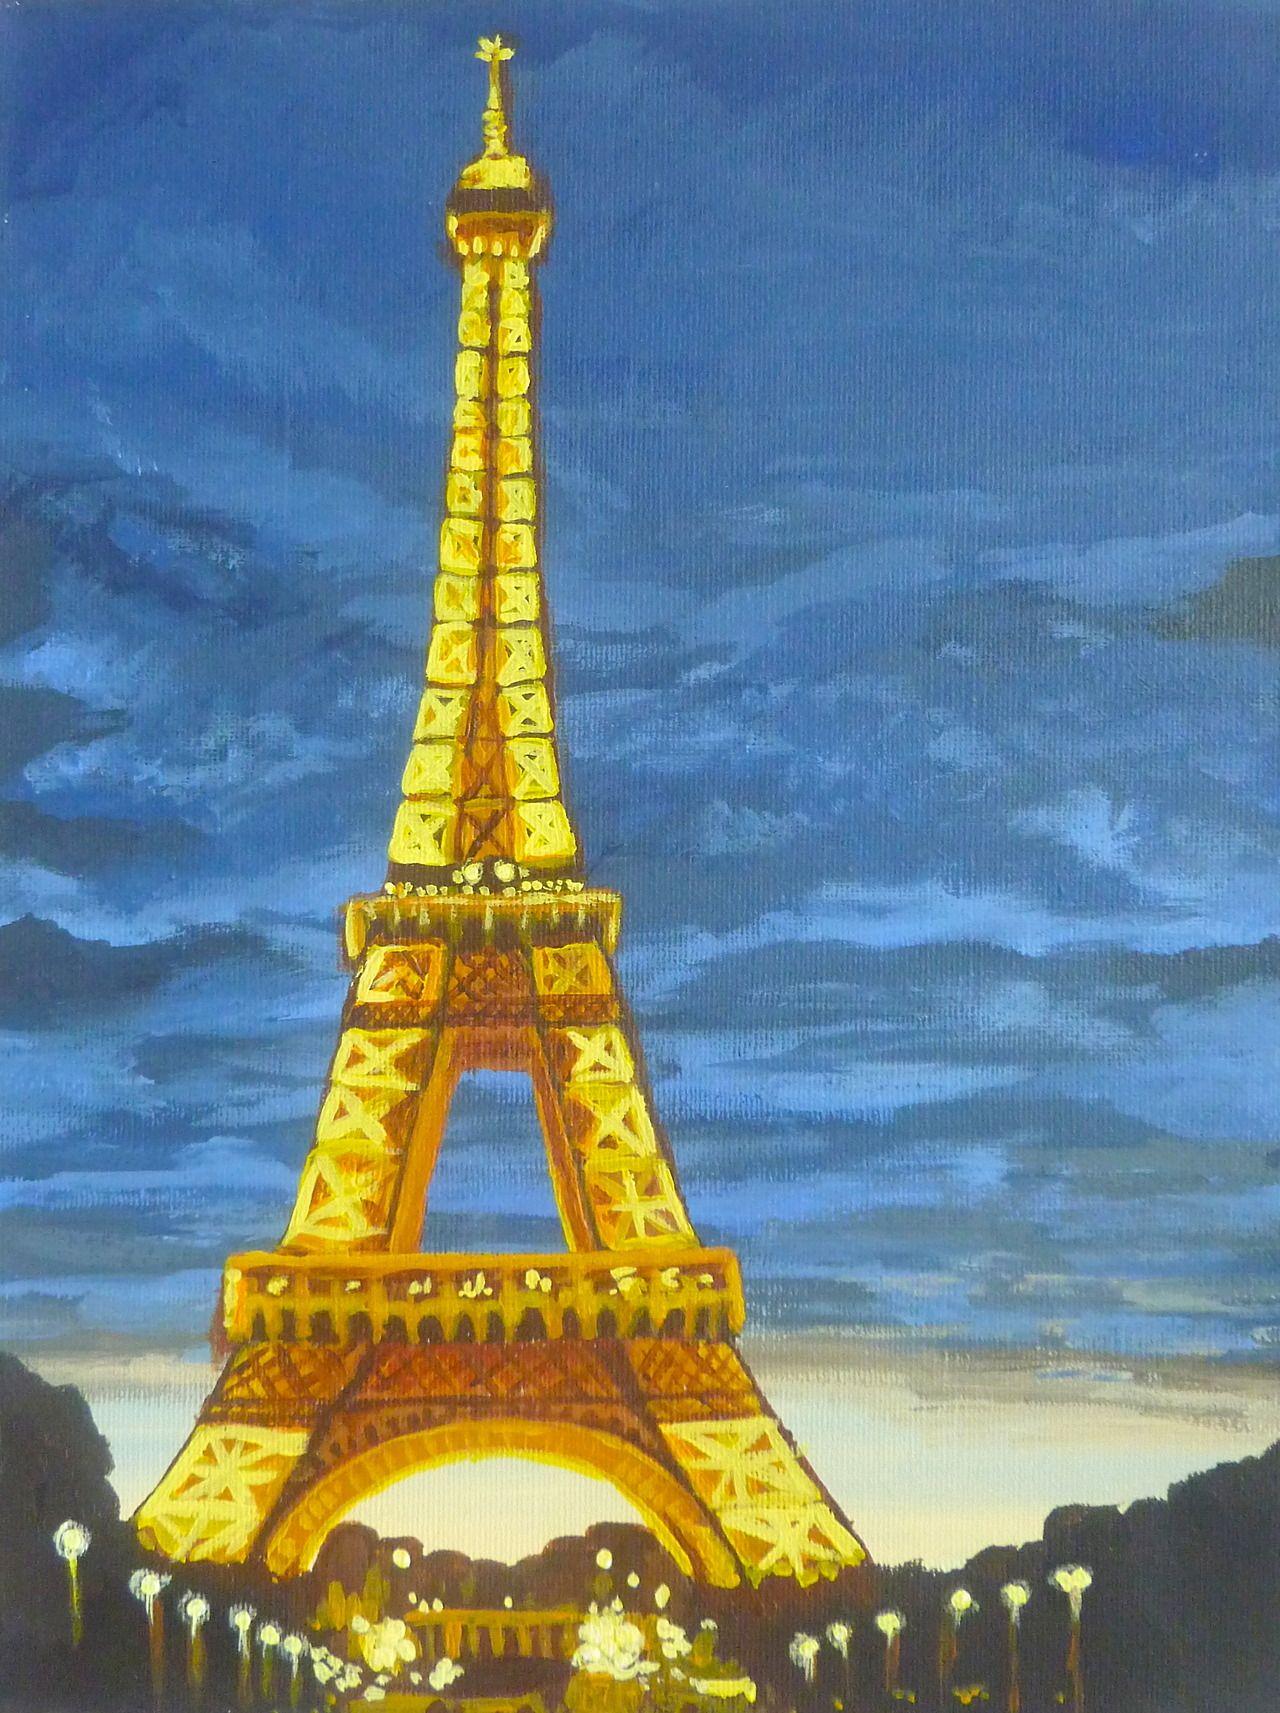 Eiffel Tower Night Art - Original Canvas Painting Cocostyle Studio Ideas In 2019